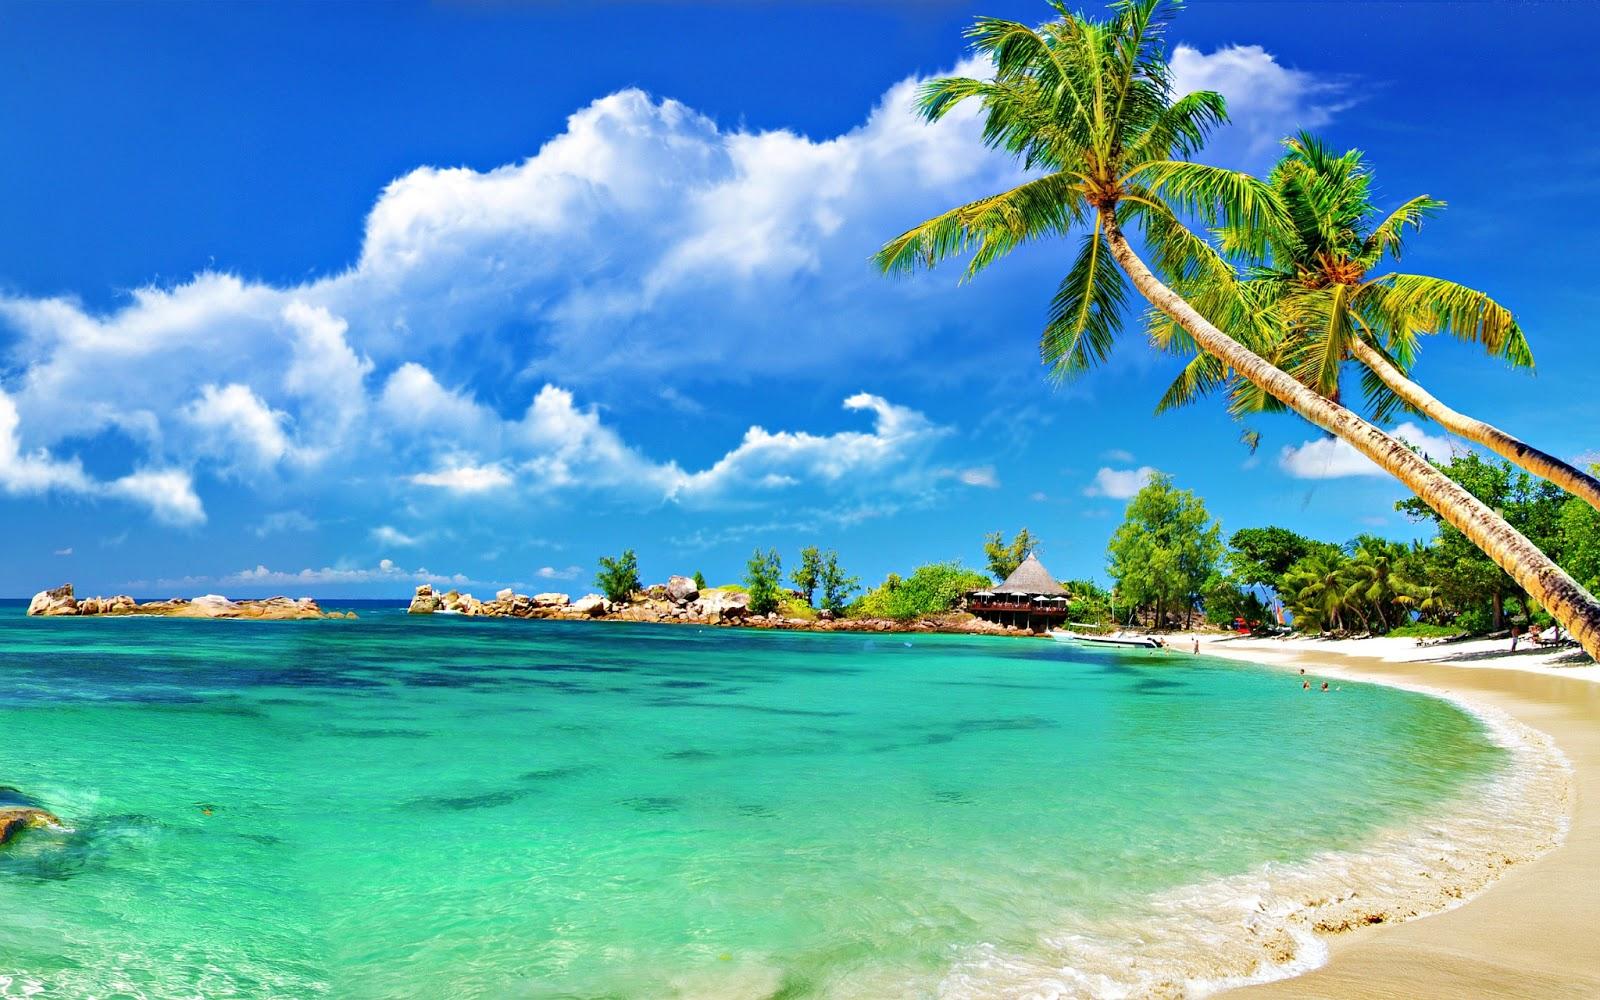 ... Fair: Download Beaches & Islands Background Wallpaper Full HD